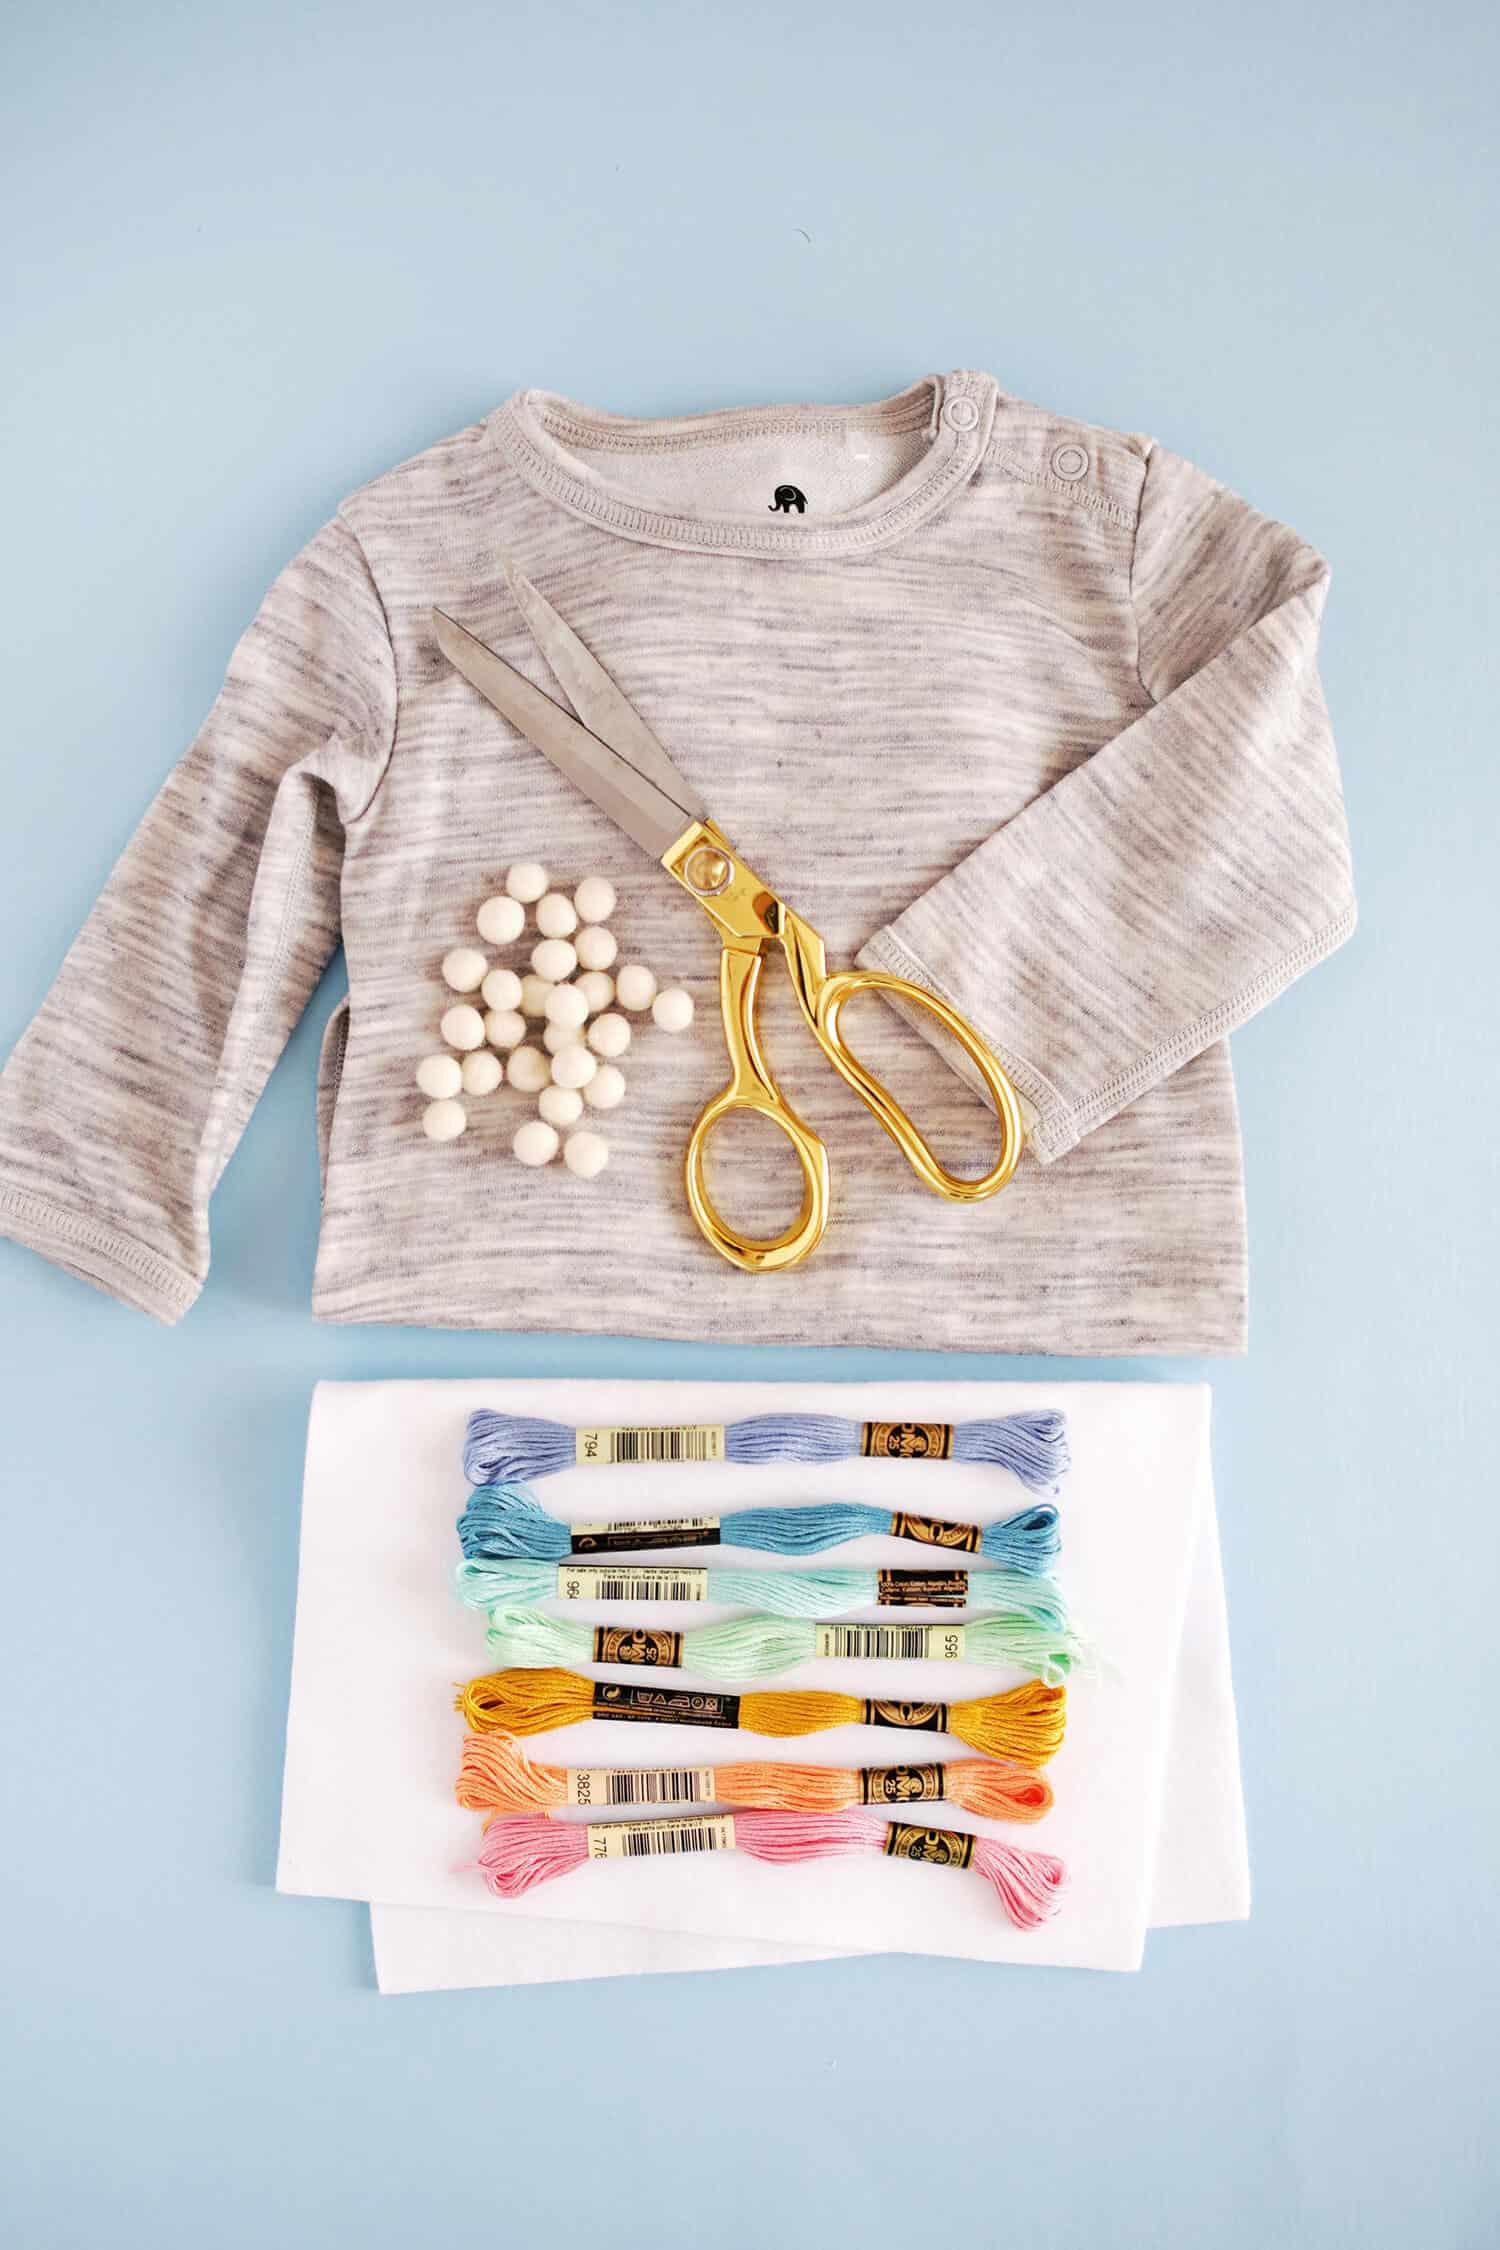 8e4fd166a -embroidery thread in 7 rainbow colors -white wool felt sheet -washi tape  -needle, thread, and fabric scissors –plain colored romper -fabric glue